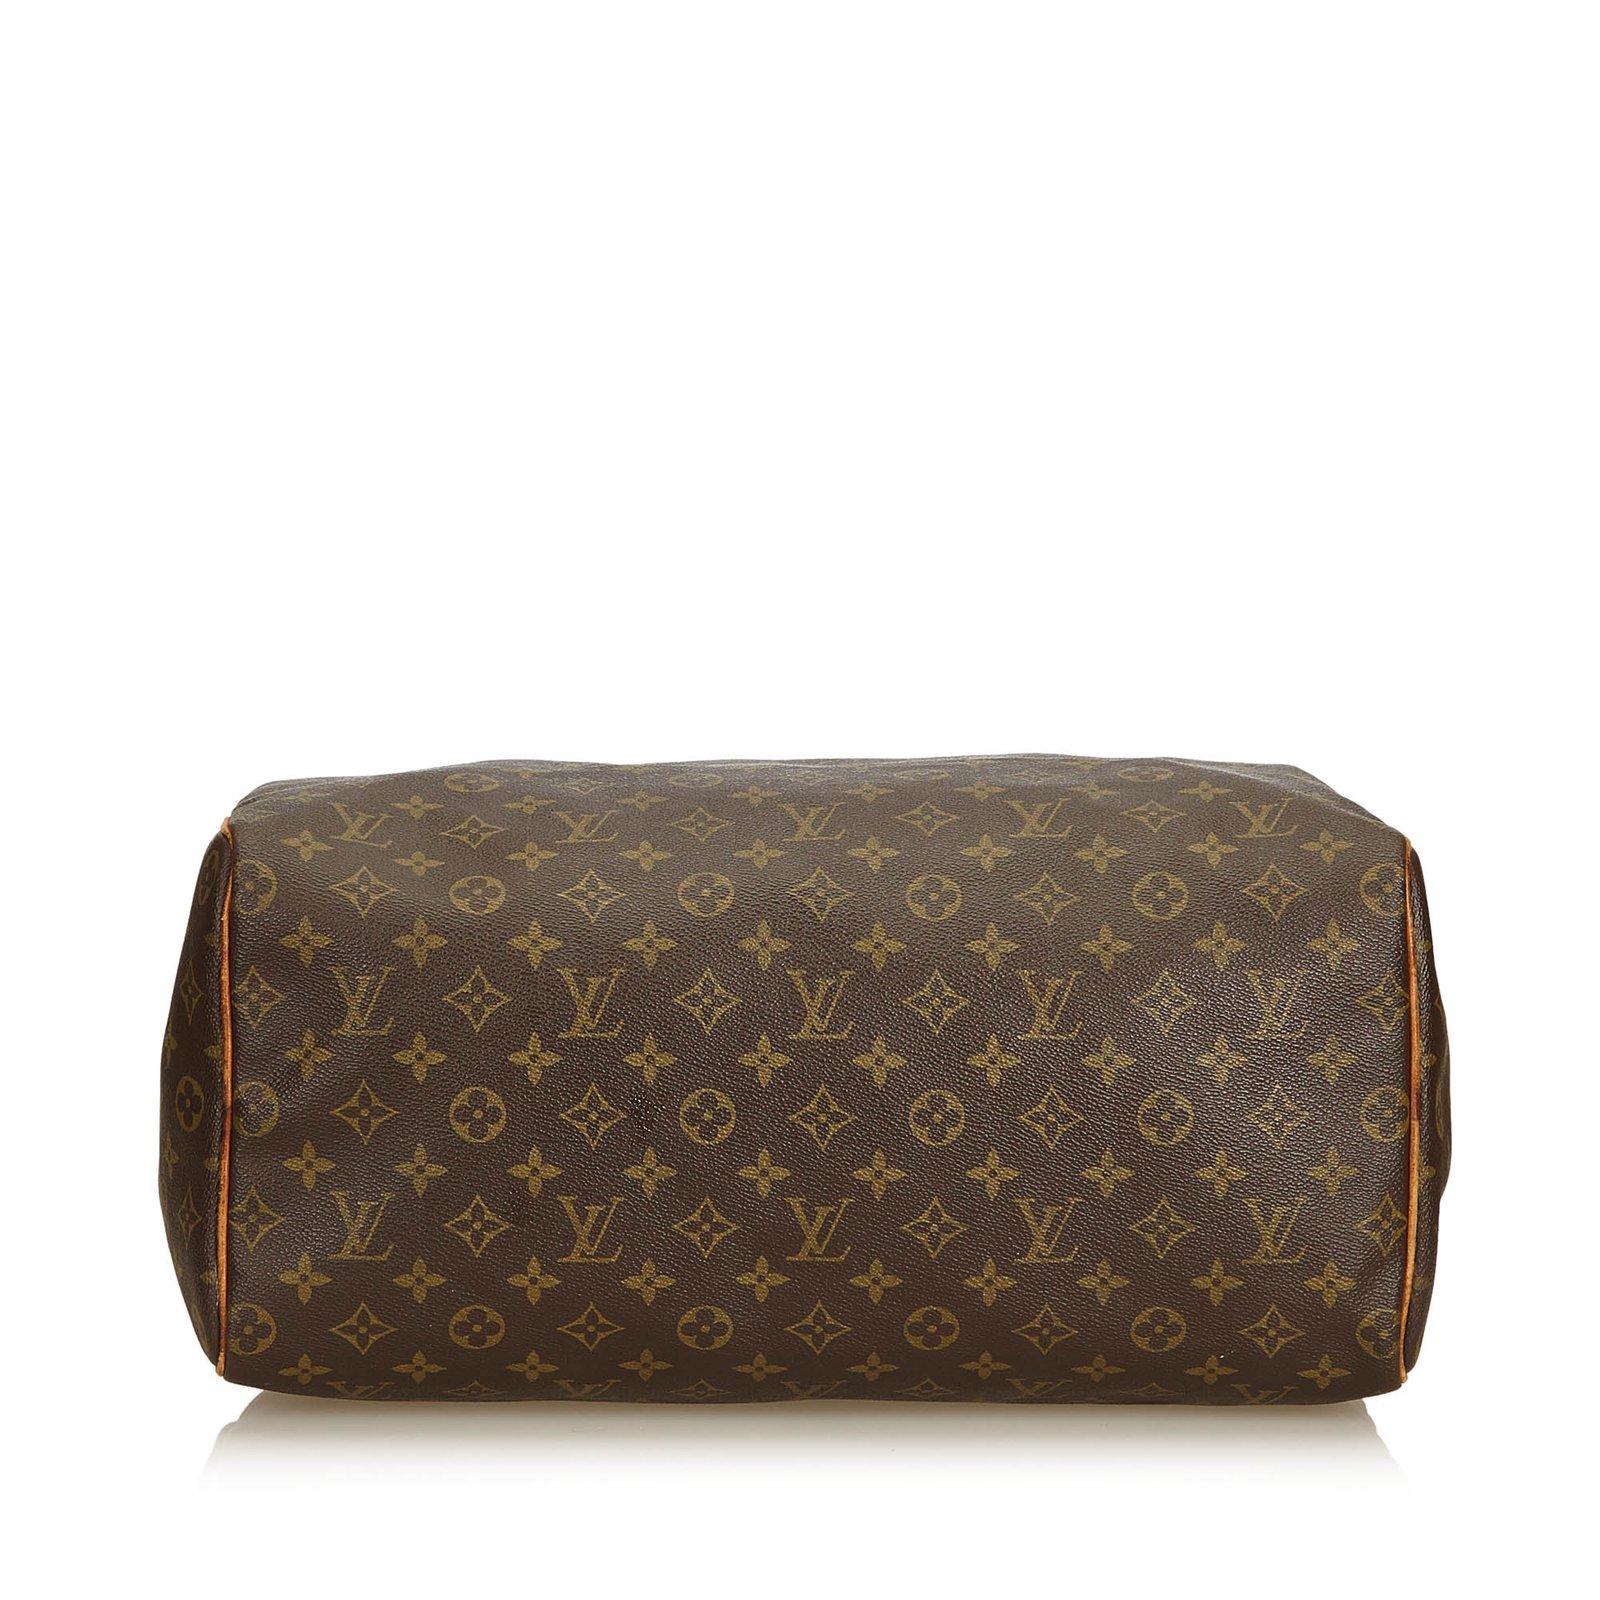 d4ea96ee7dd6 Louis Vuitton Monogram Speedy 40 Handbags Leather